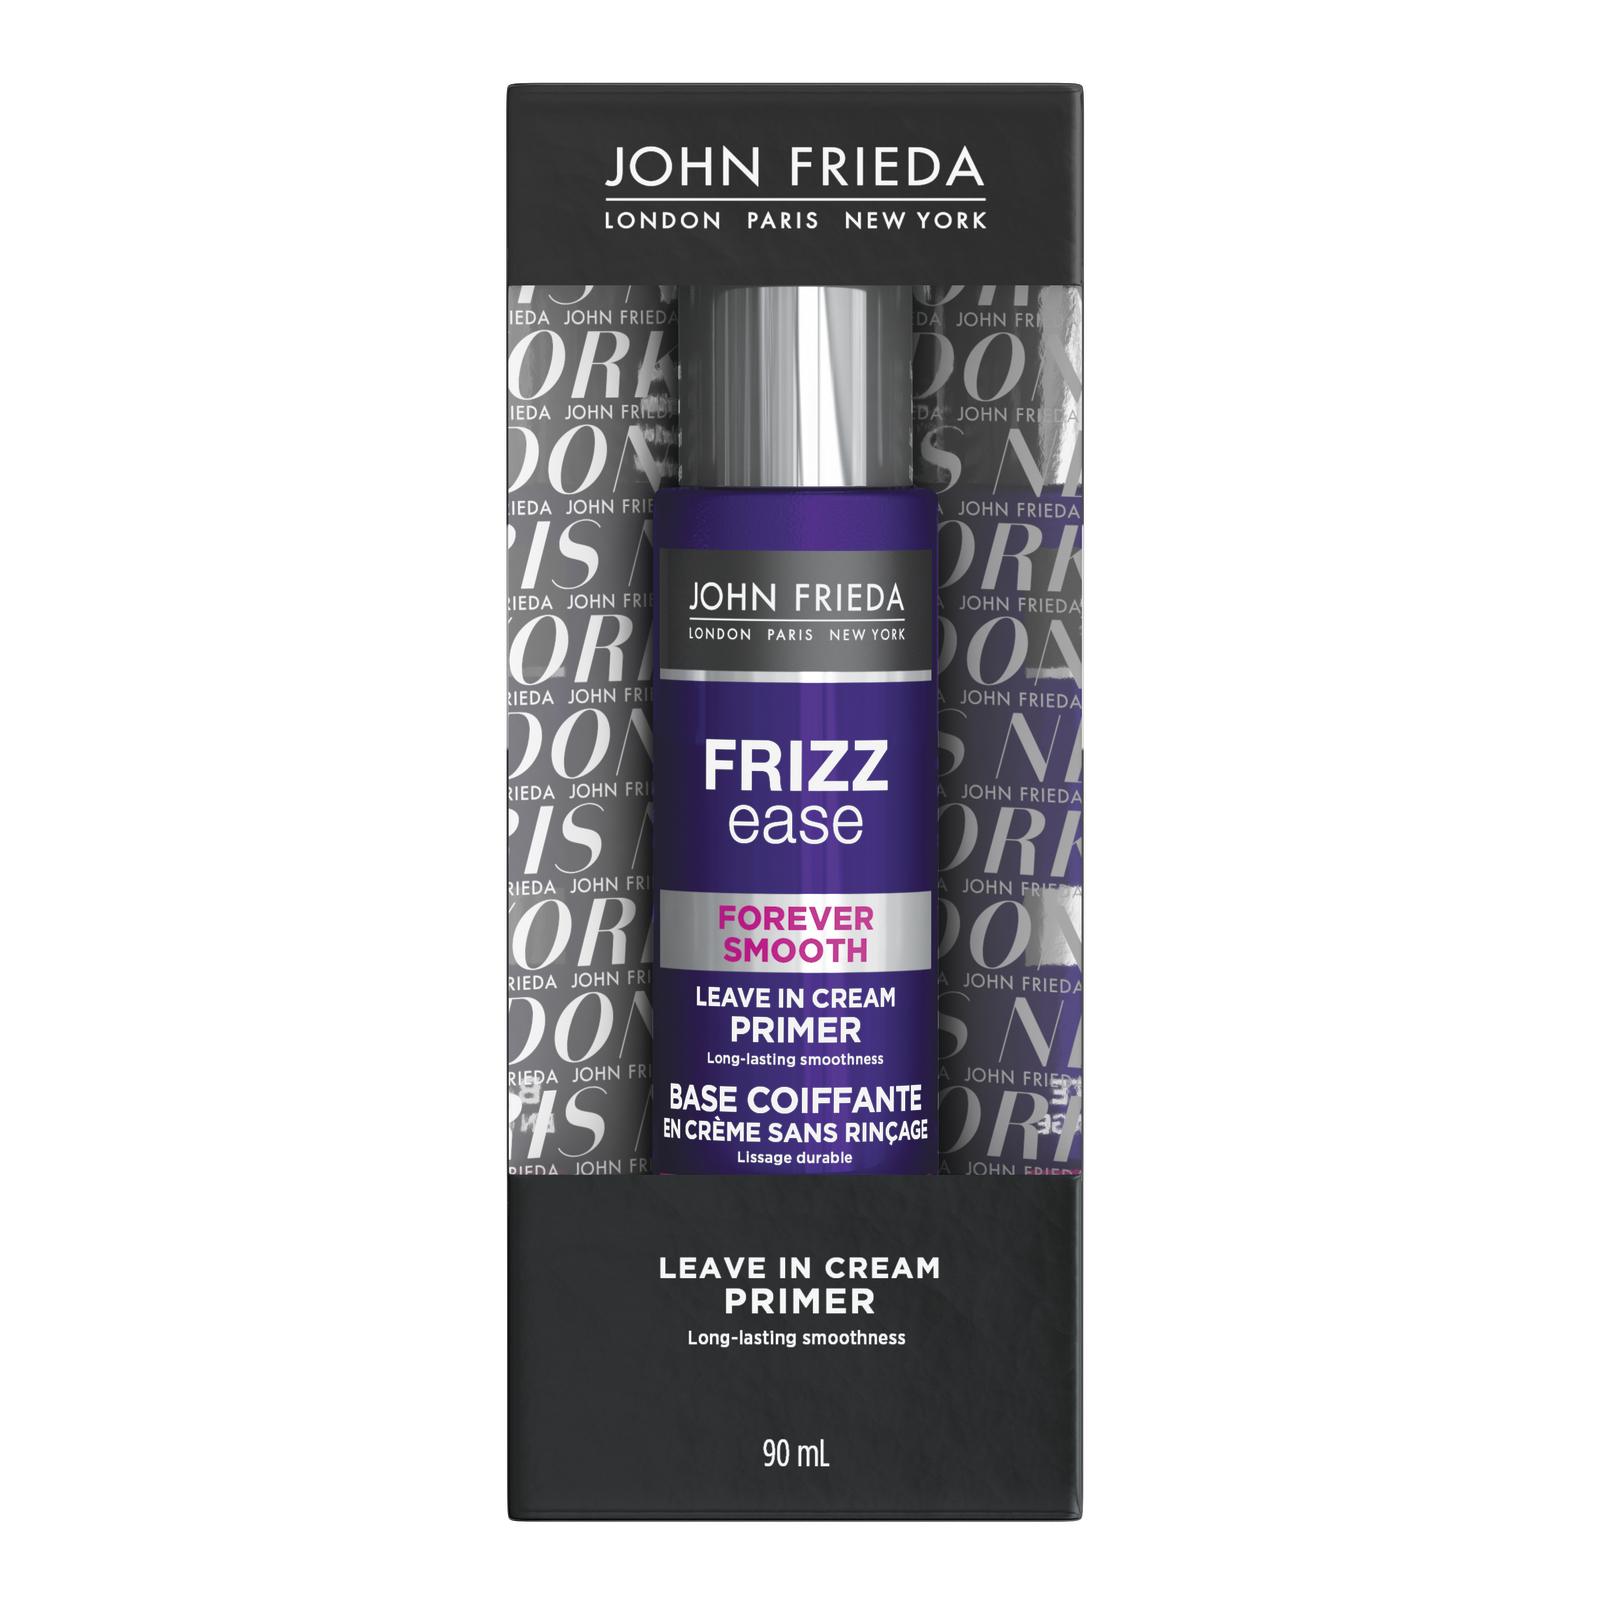 John Frieda Frizz Ease Beyond Smooth Anti-Frizz Primer (90ml) image